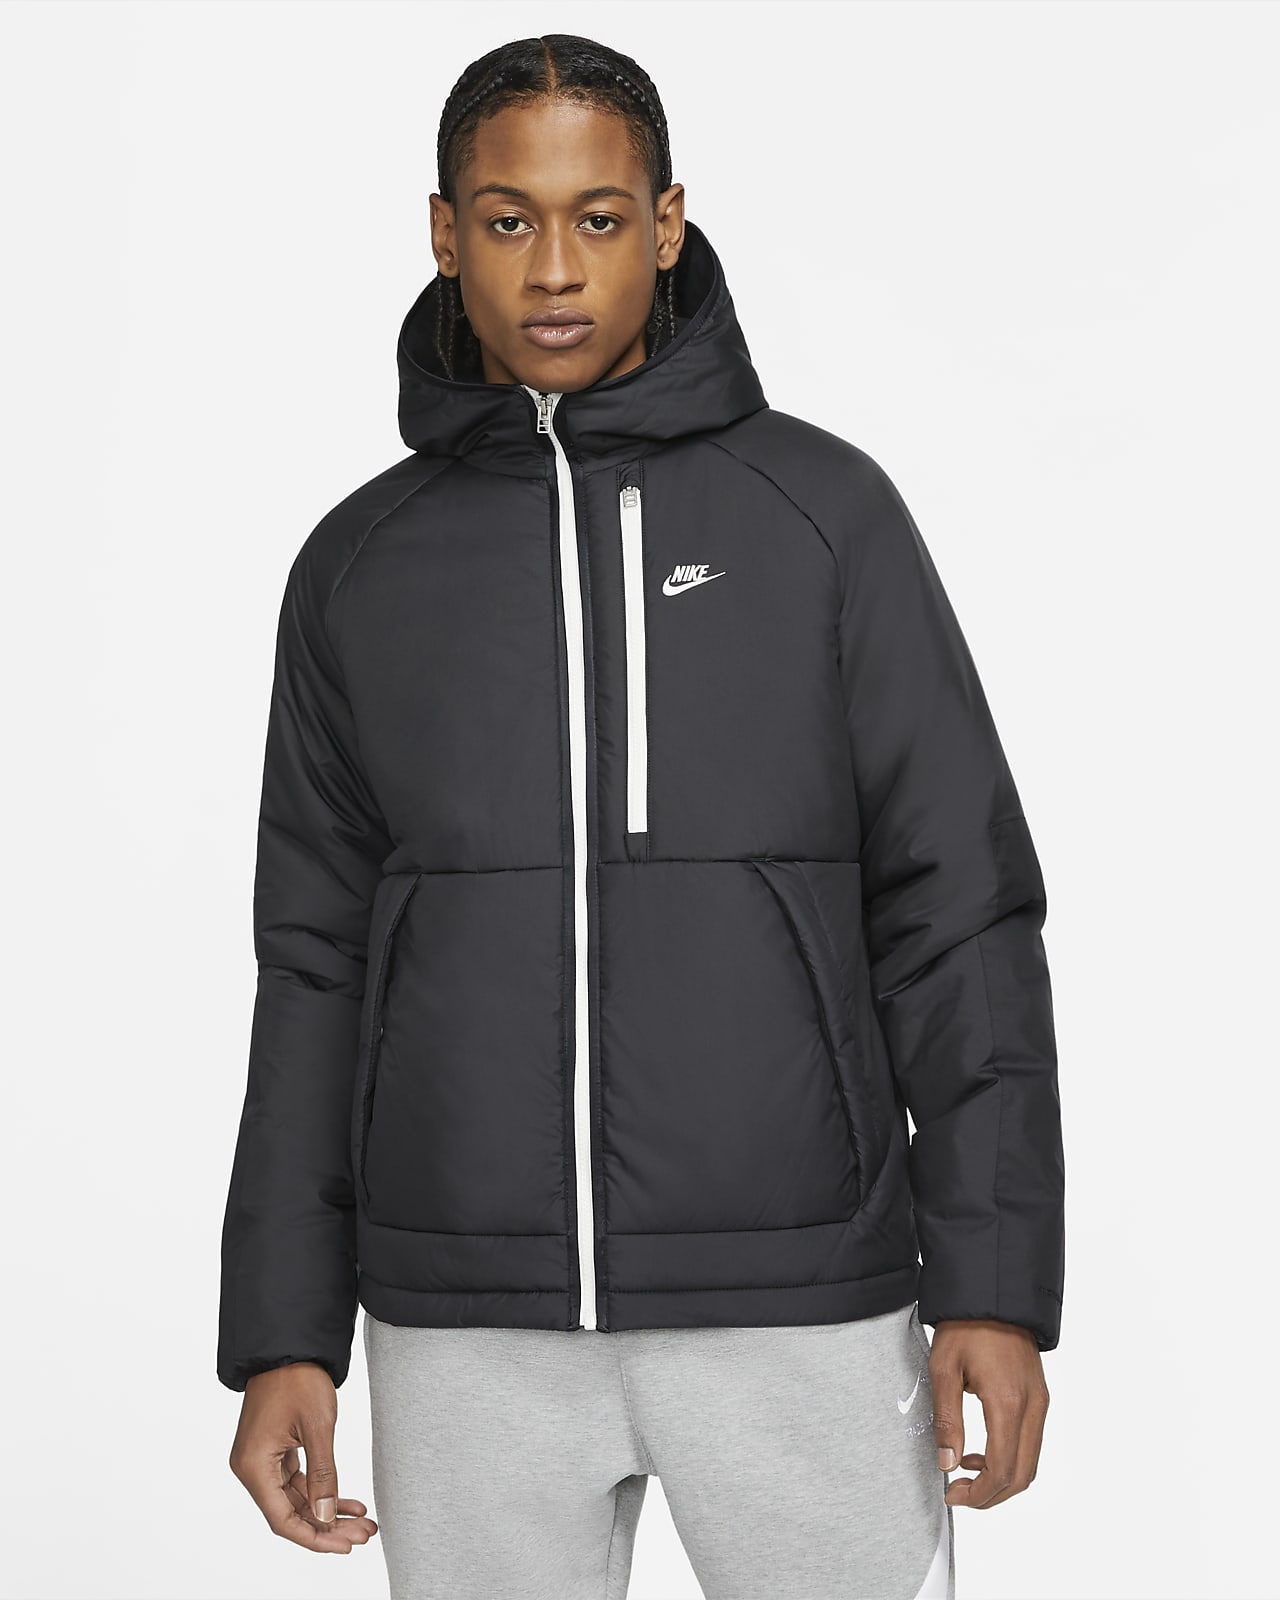 Nike Sportswear Therma-FIT Legacy Kapüşonlu Erkek Ceketi